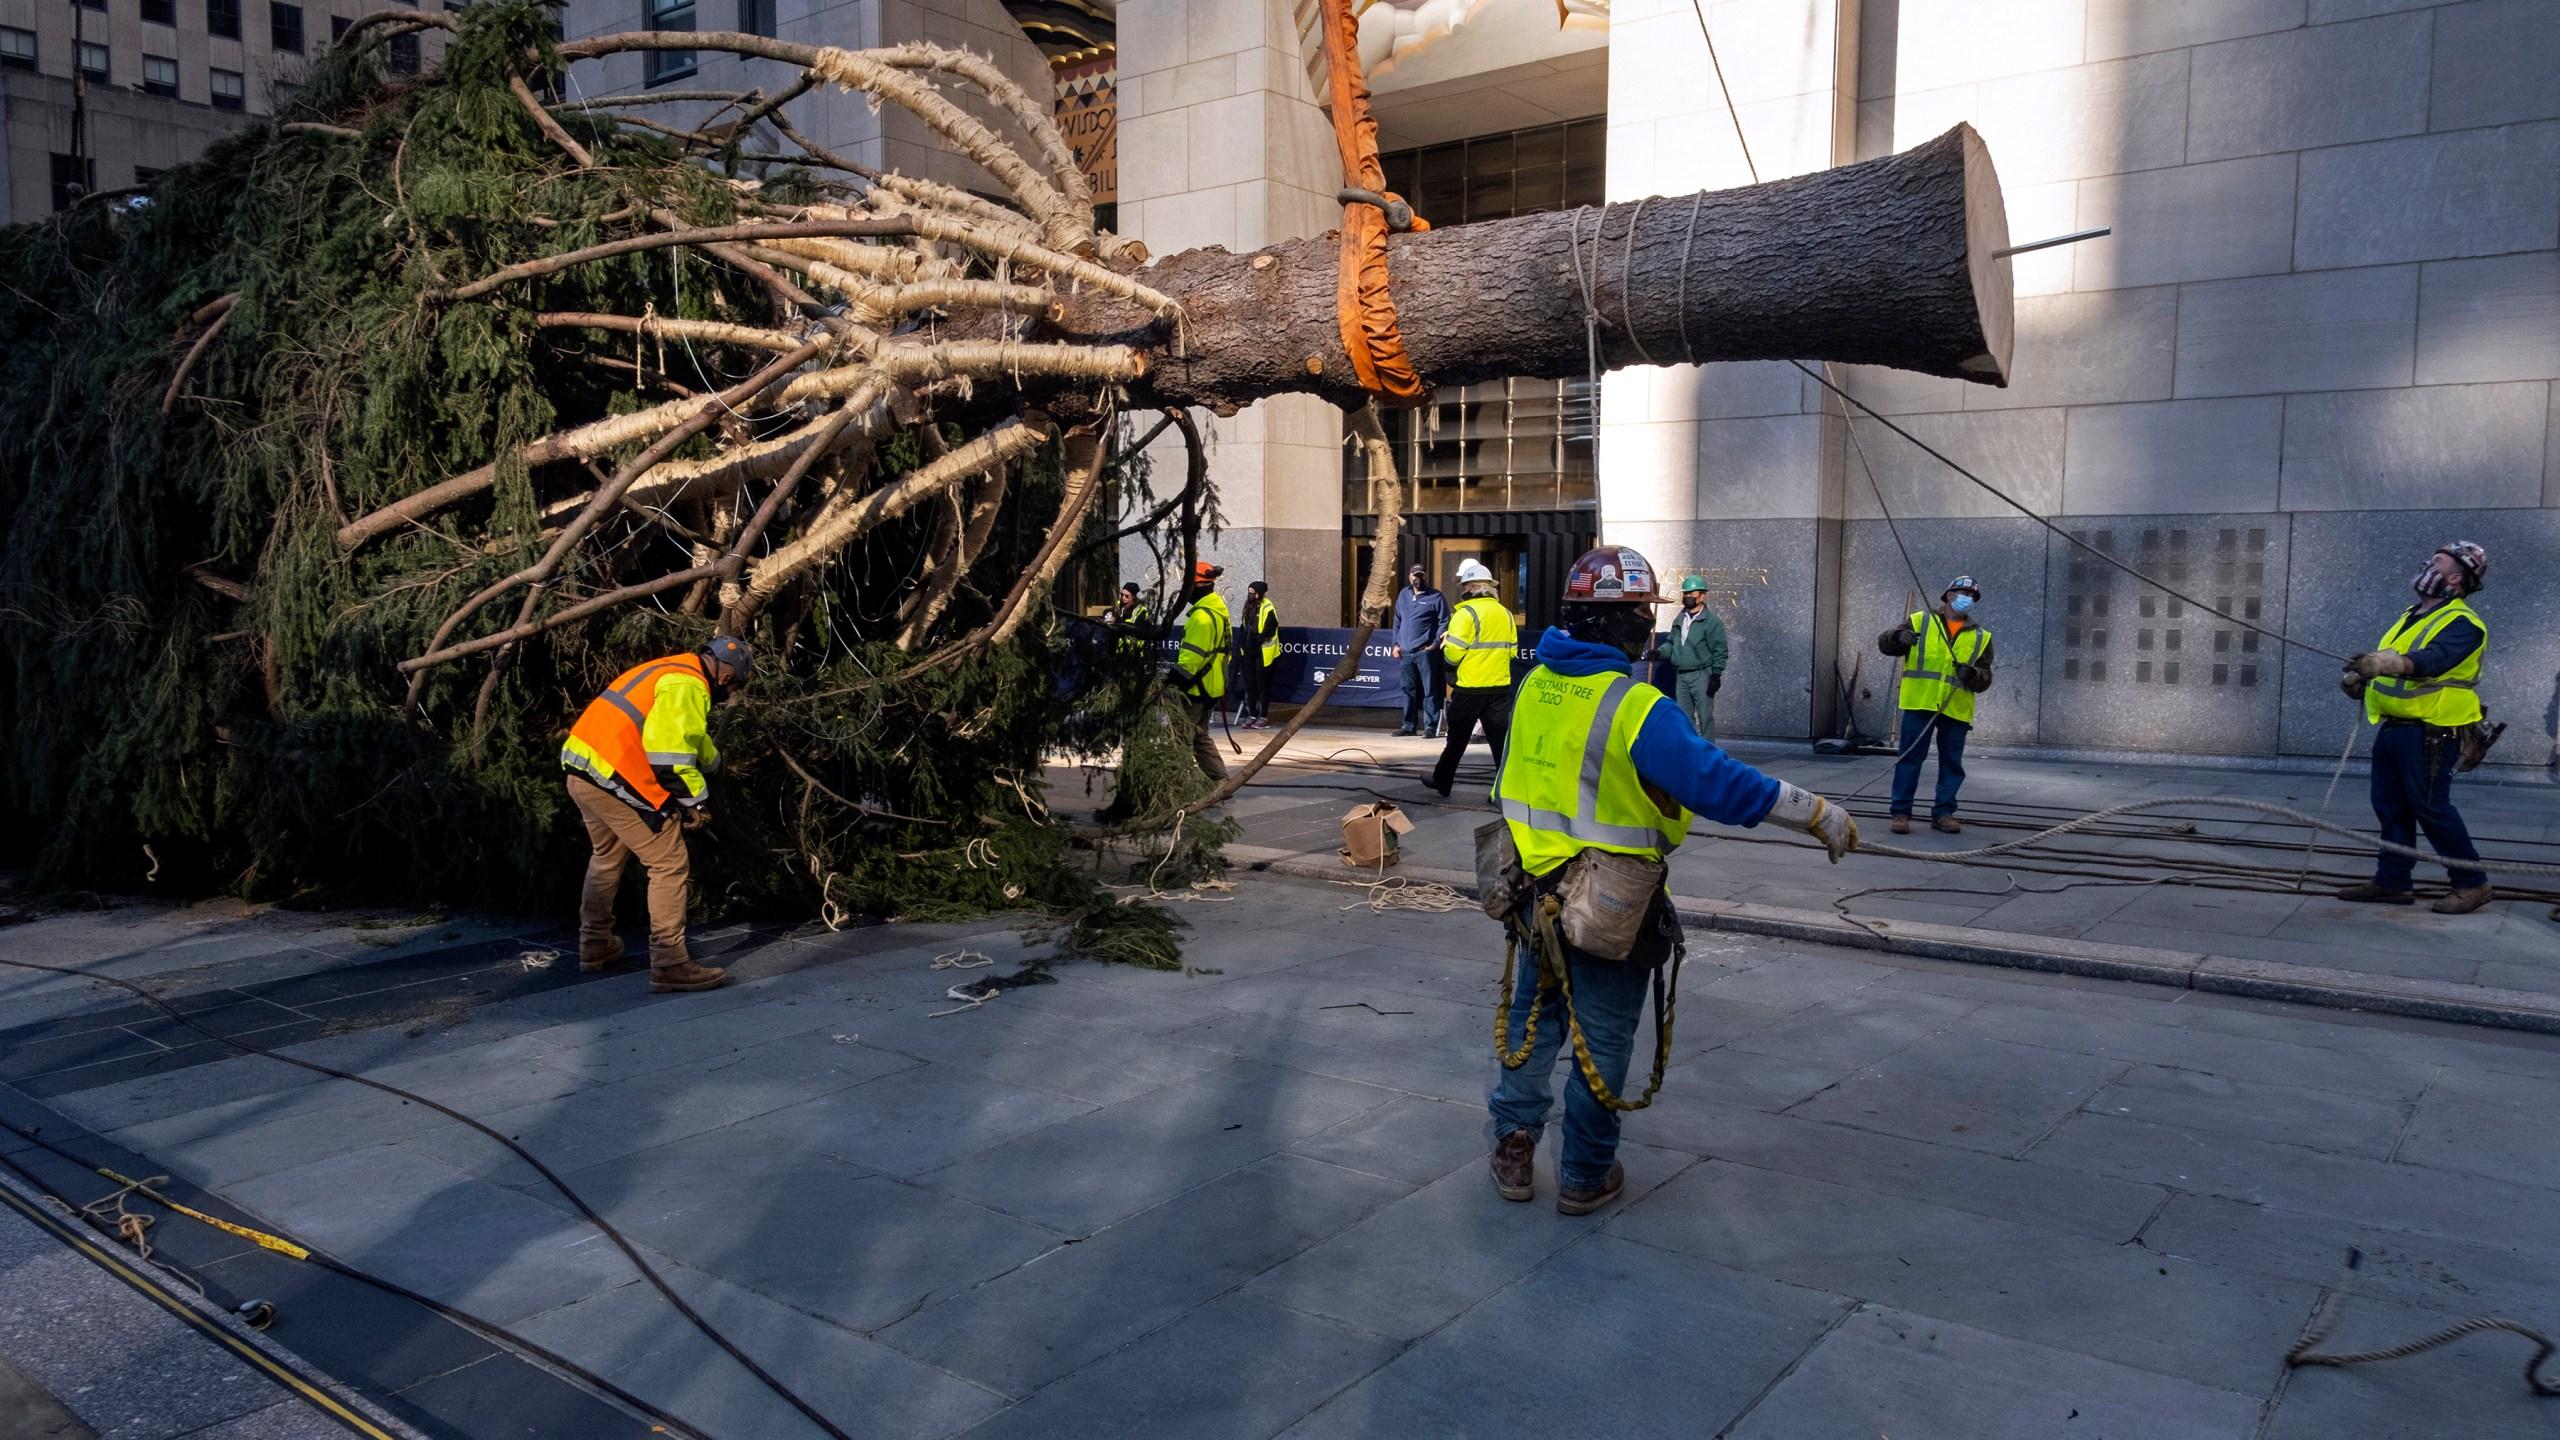 San Diego Christmas Tree Lighting 2020 Rockefeller Center Christmas tree arrives; lighting Dec. 2   FOX 5